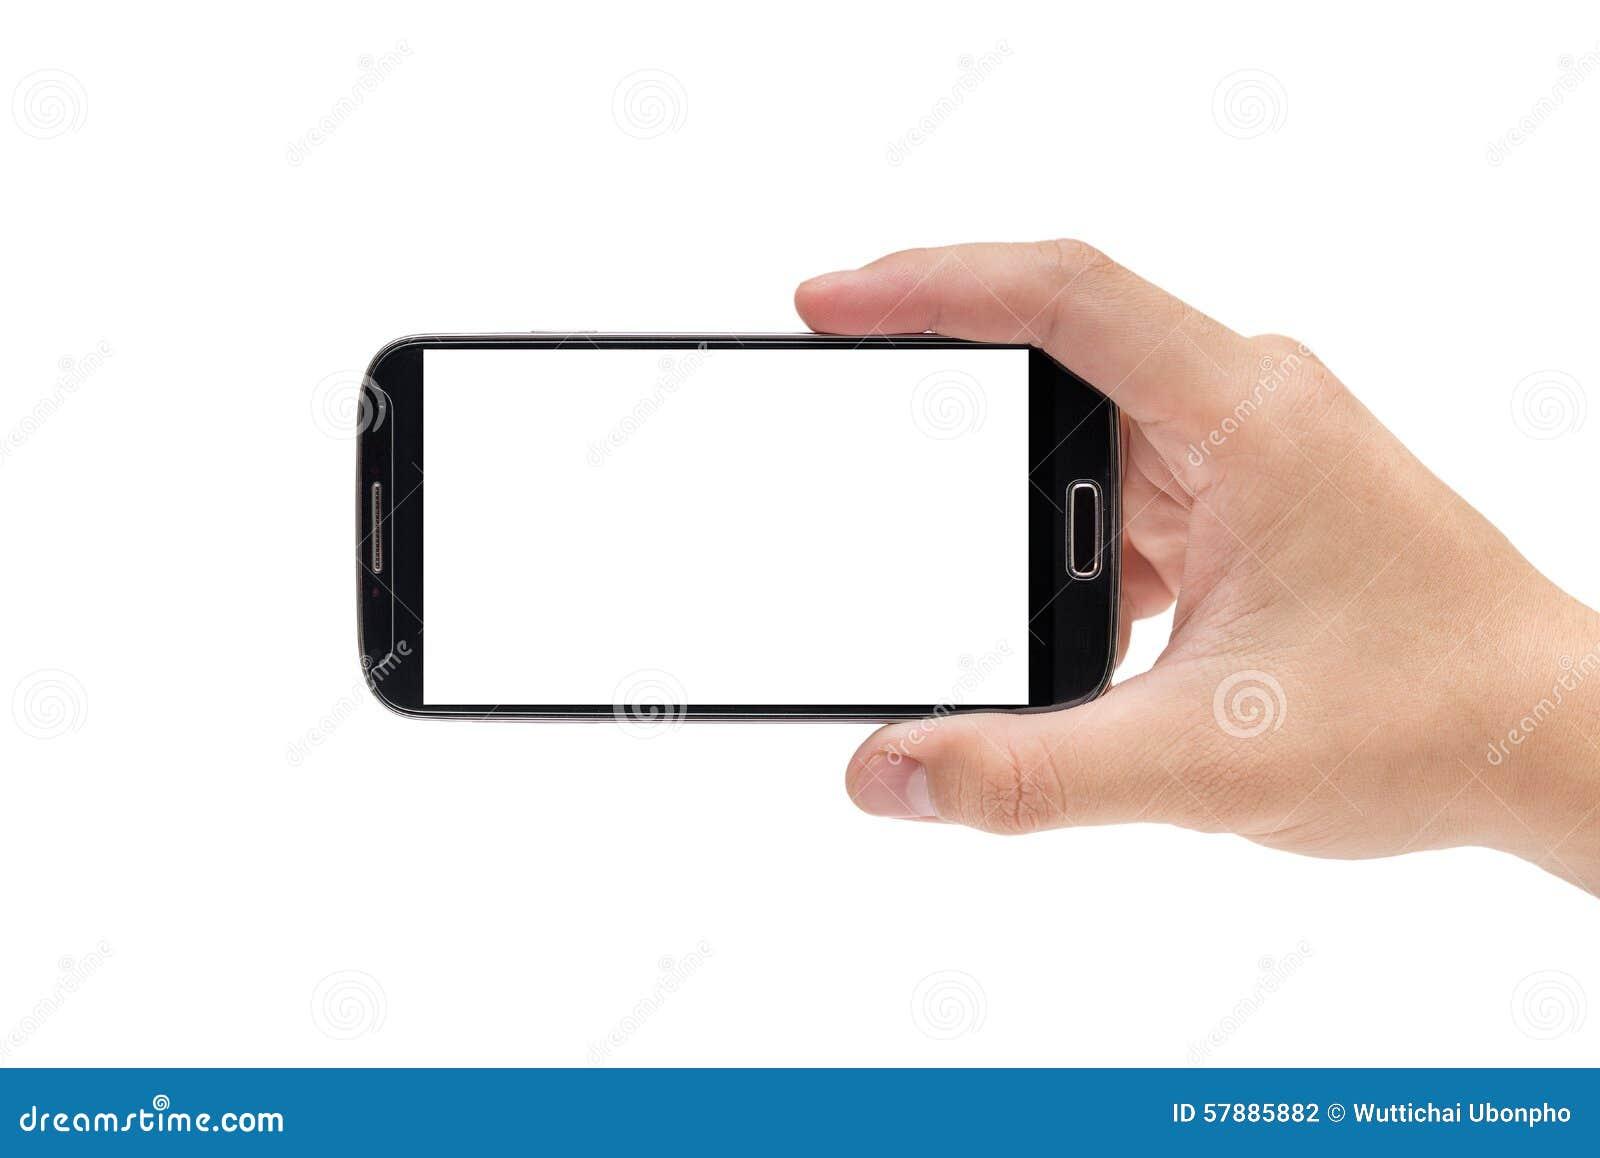 telfonos de putas mano